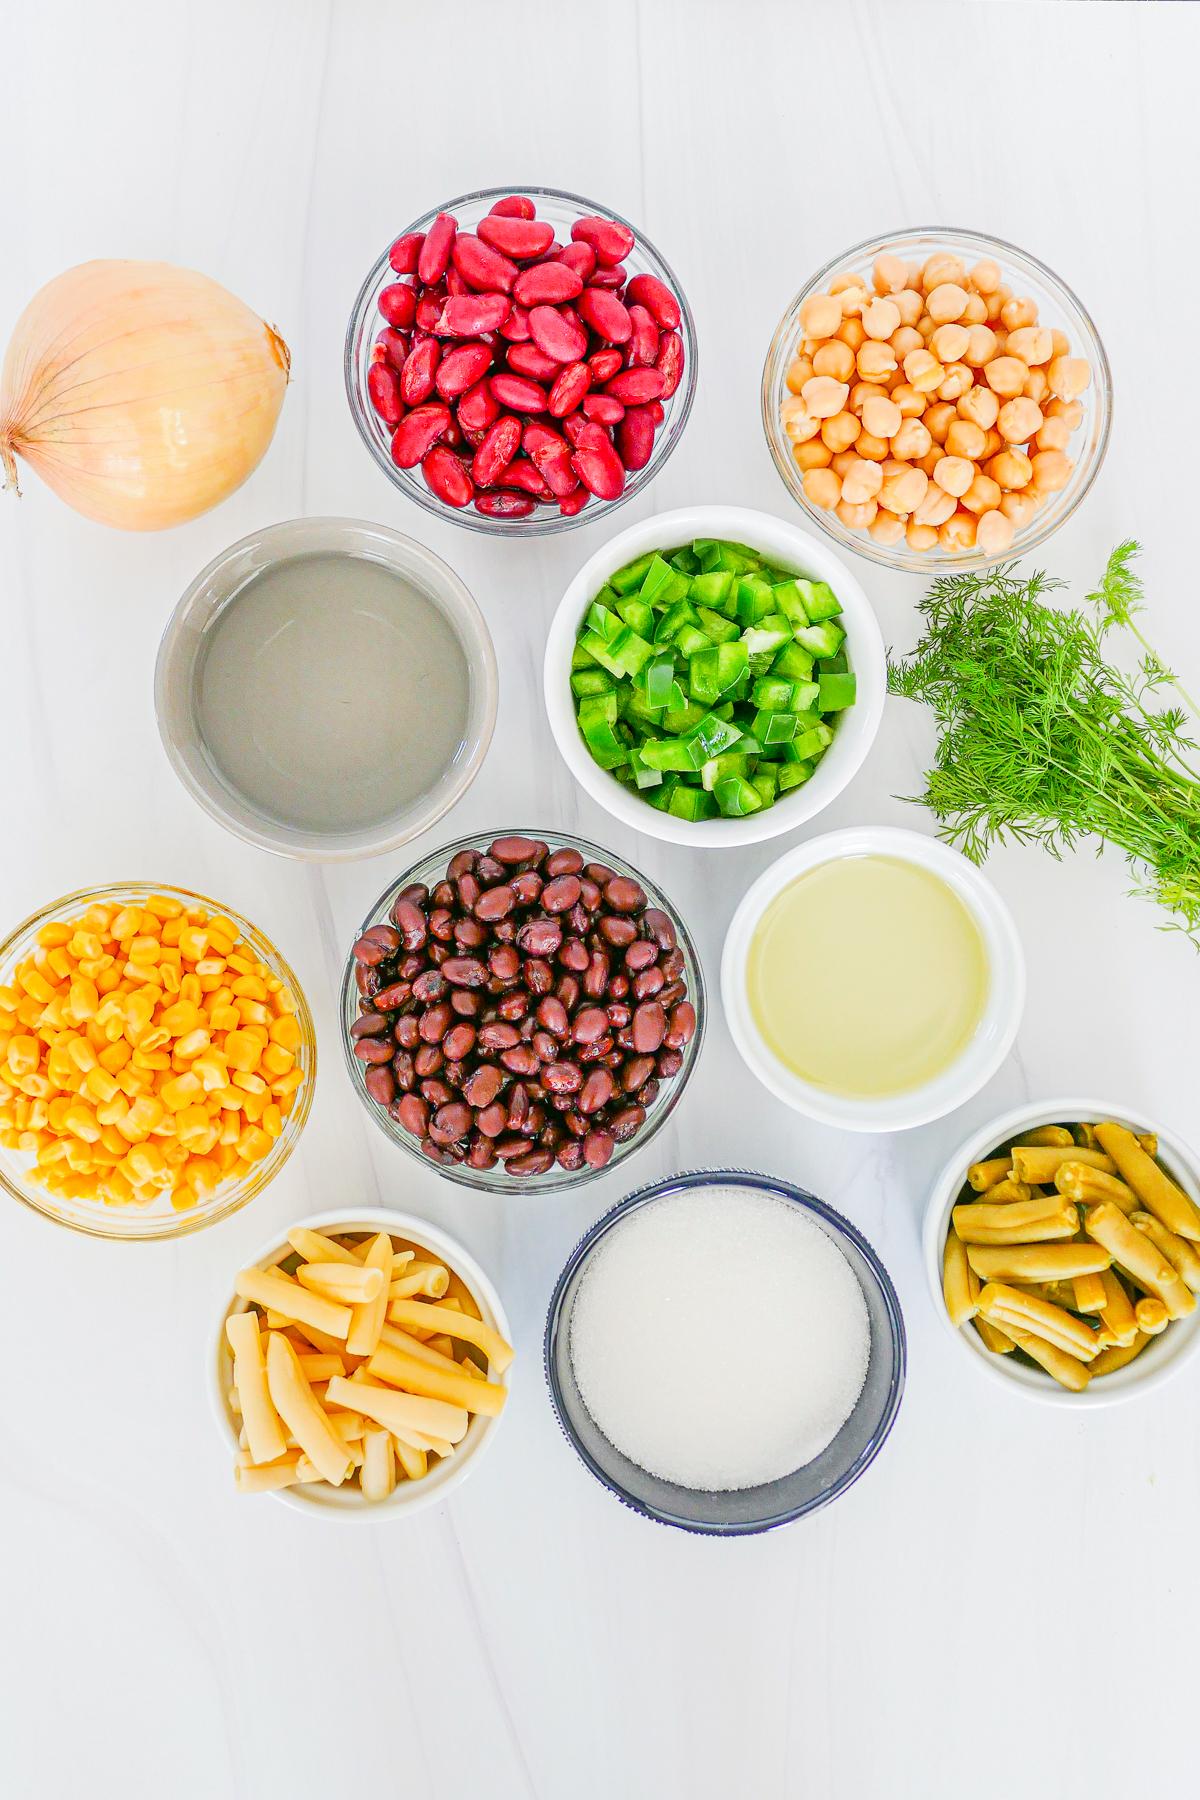 Ingredients needed to make 5 Bean Salad